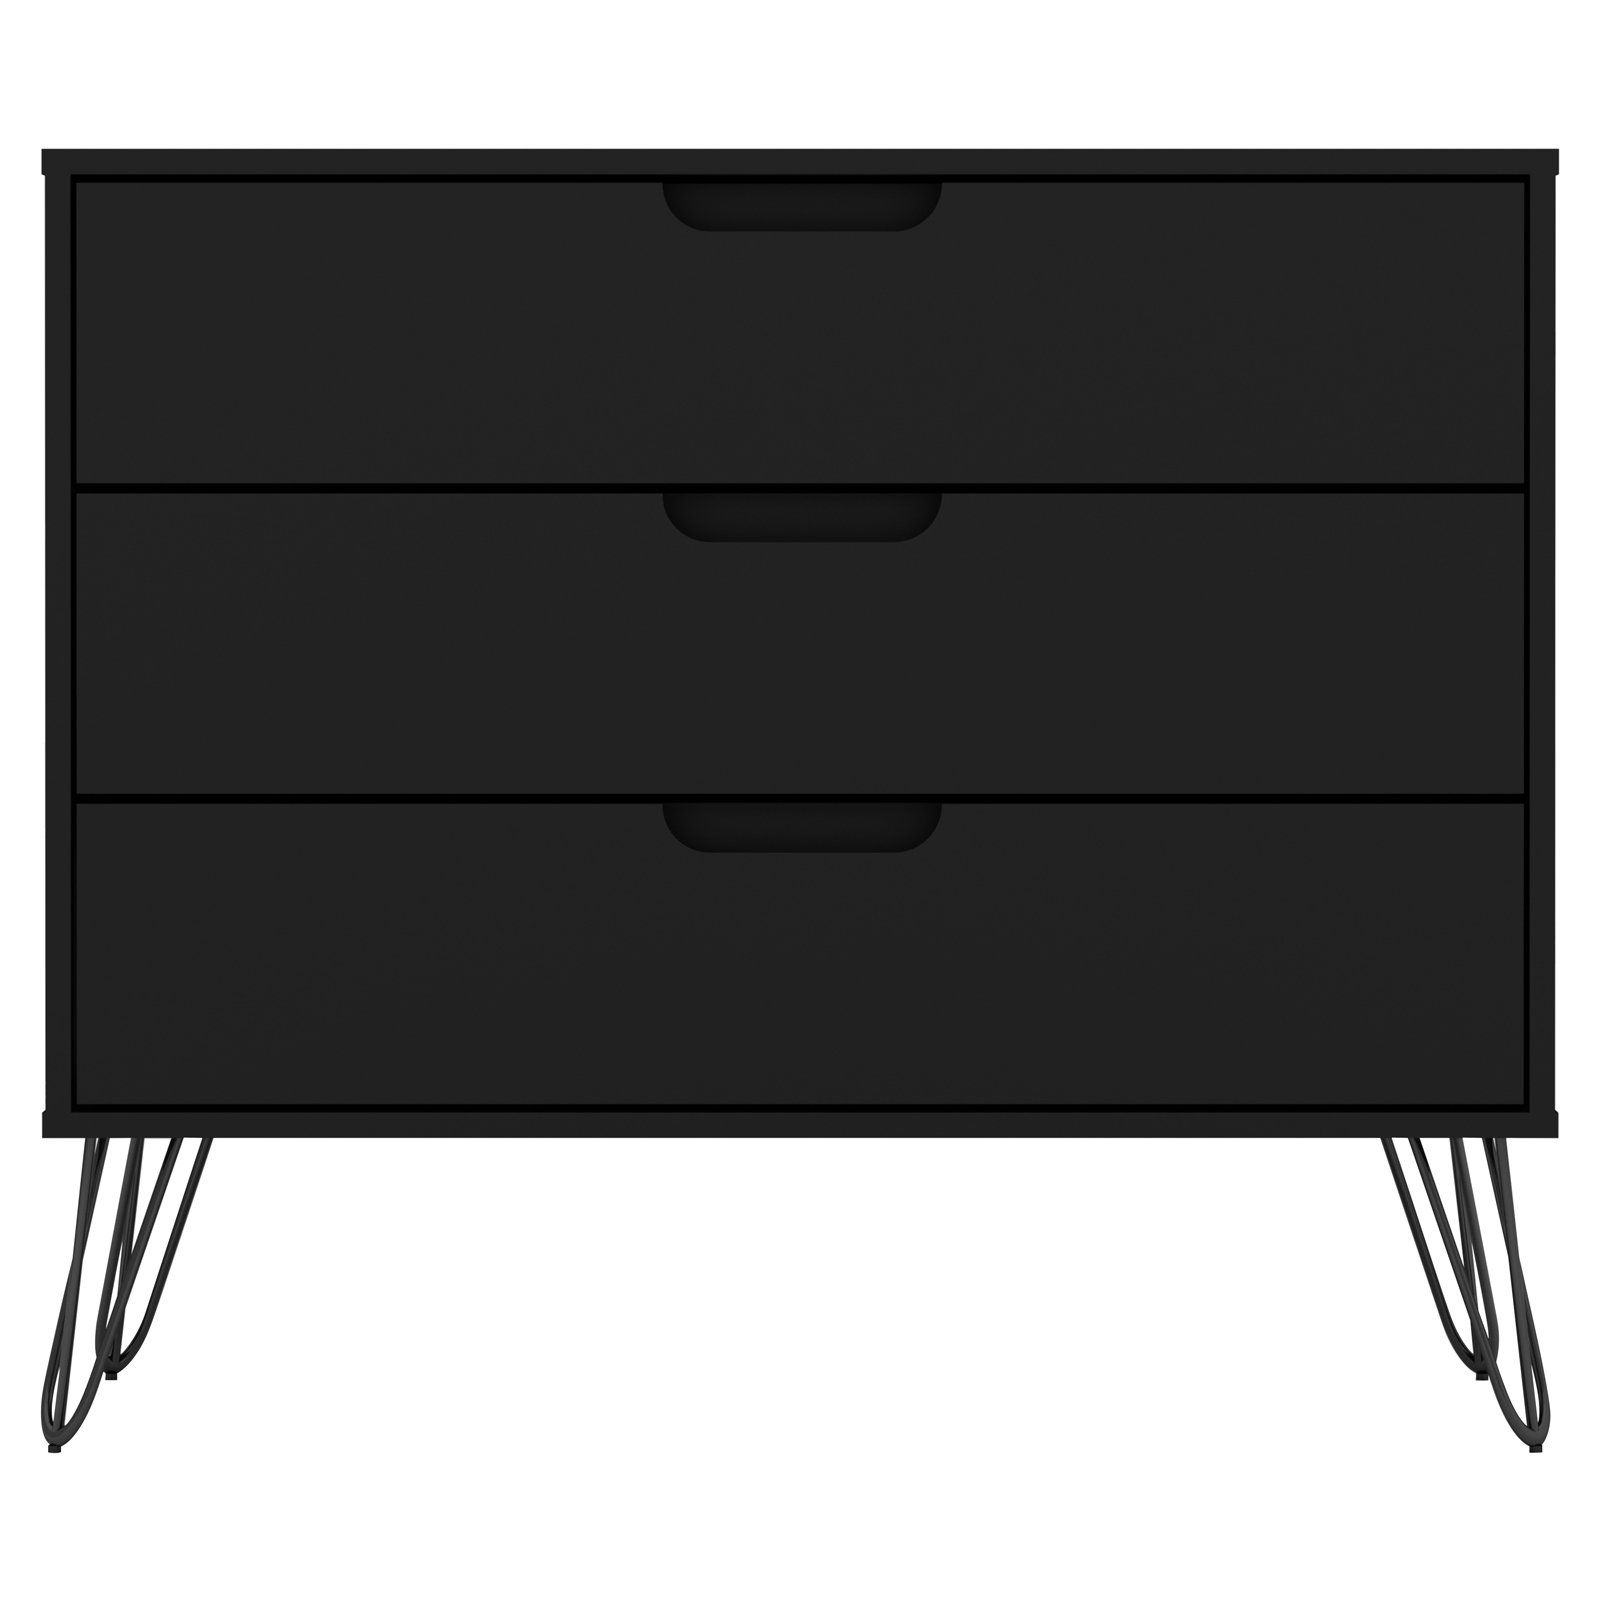 Manhattan Comfort Rockefeller 3 Drawer Dresser In 2021 Manhattan Comfort Dresser Drawers Modern Dresser [ 1600 x 1600 Pixel ]